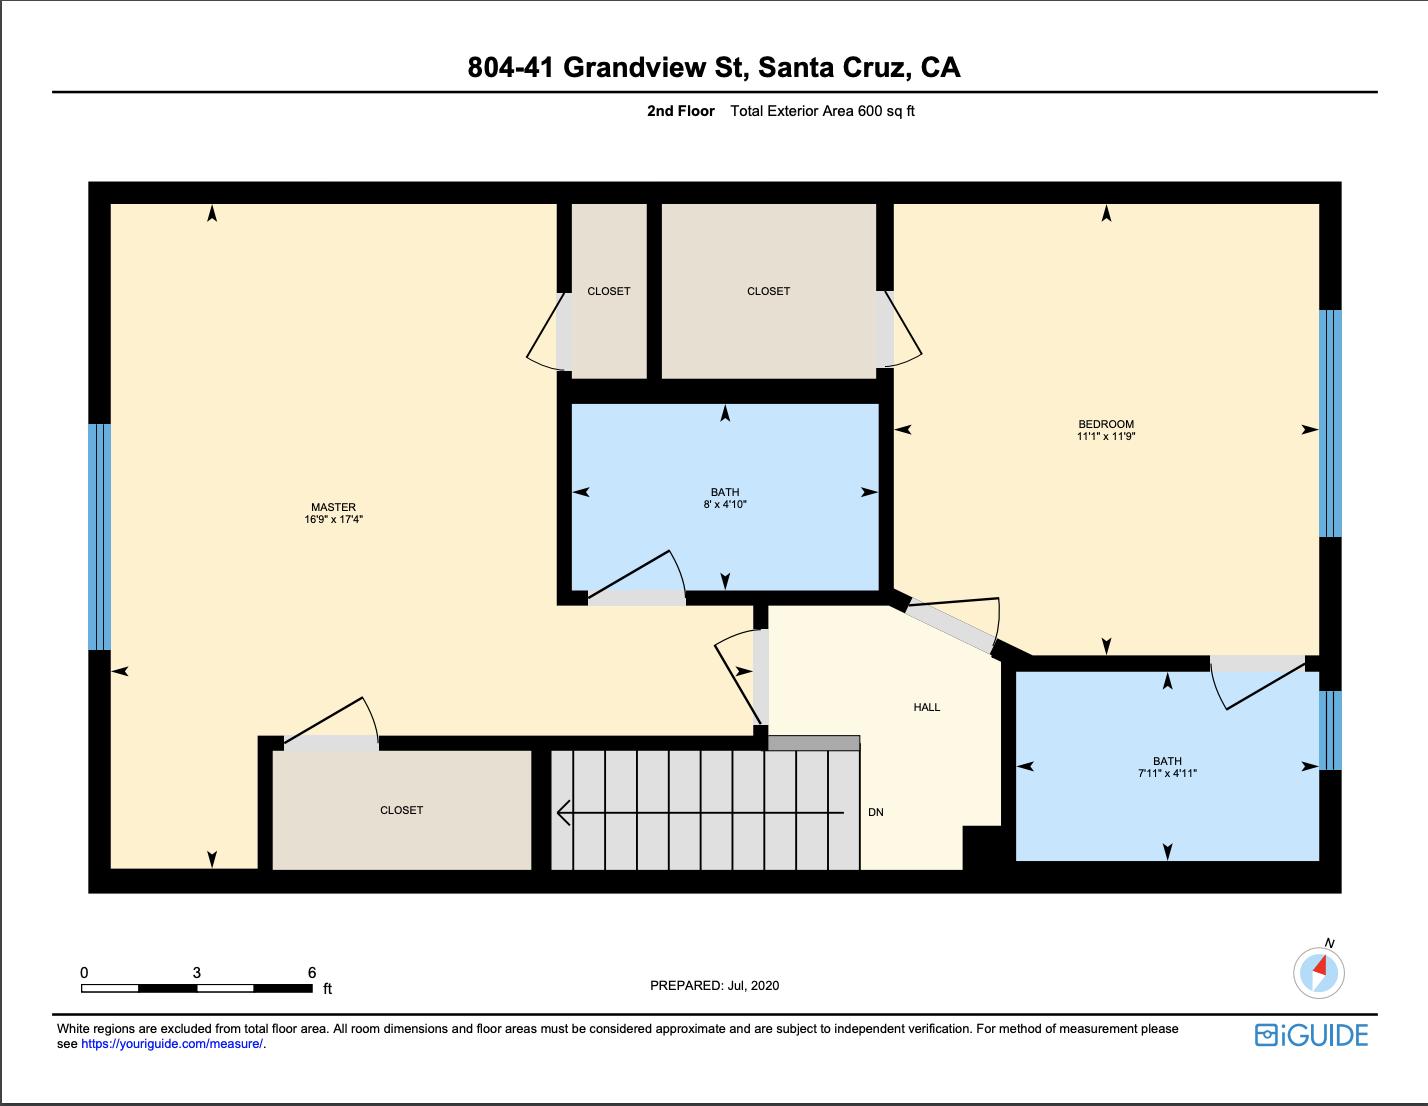 41 grandview 804 - second level floor plan